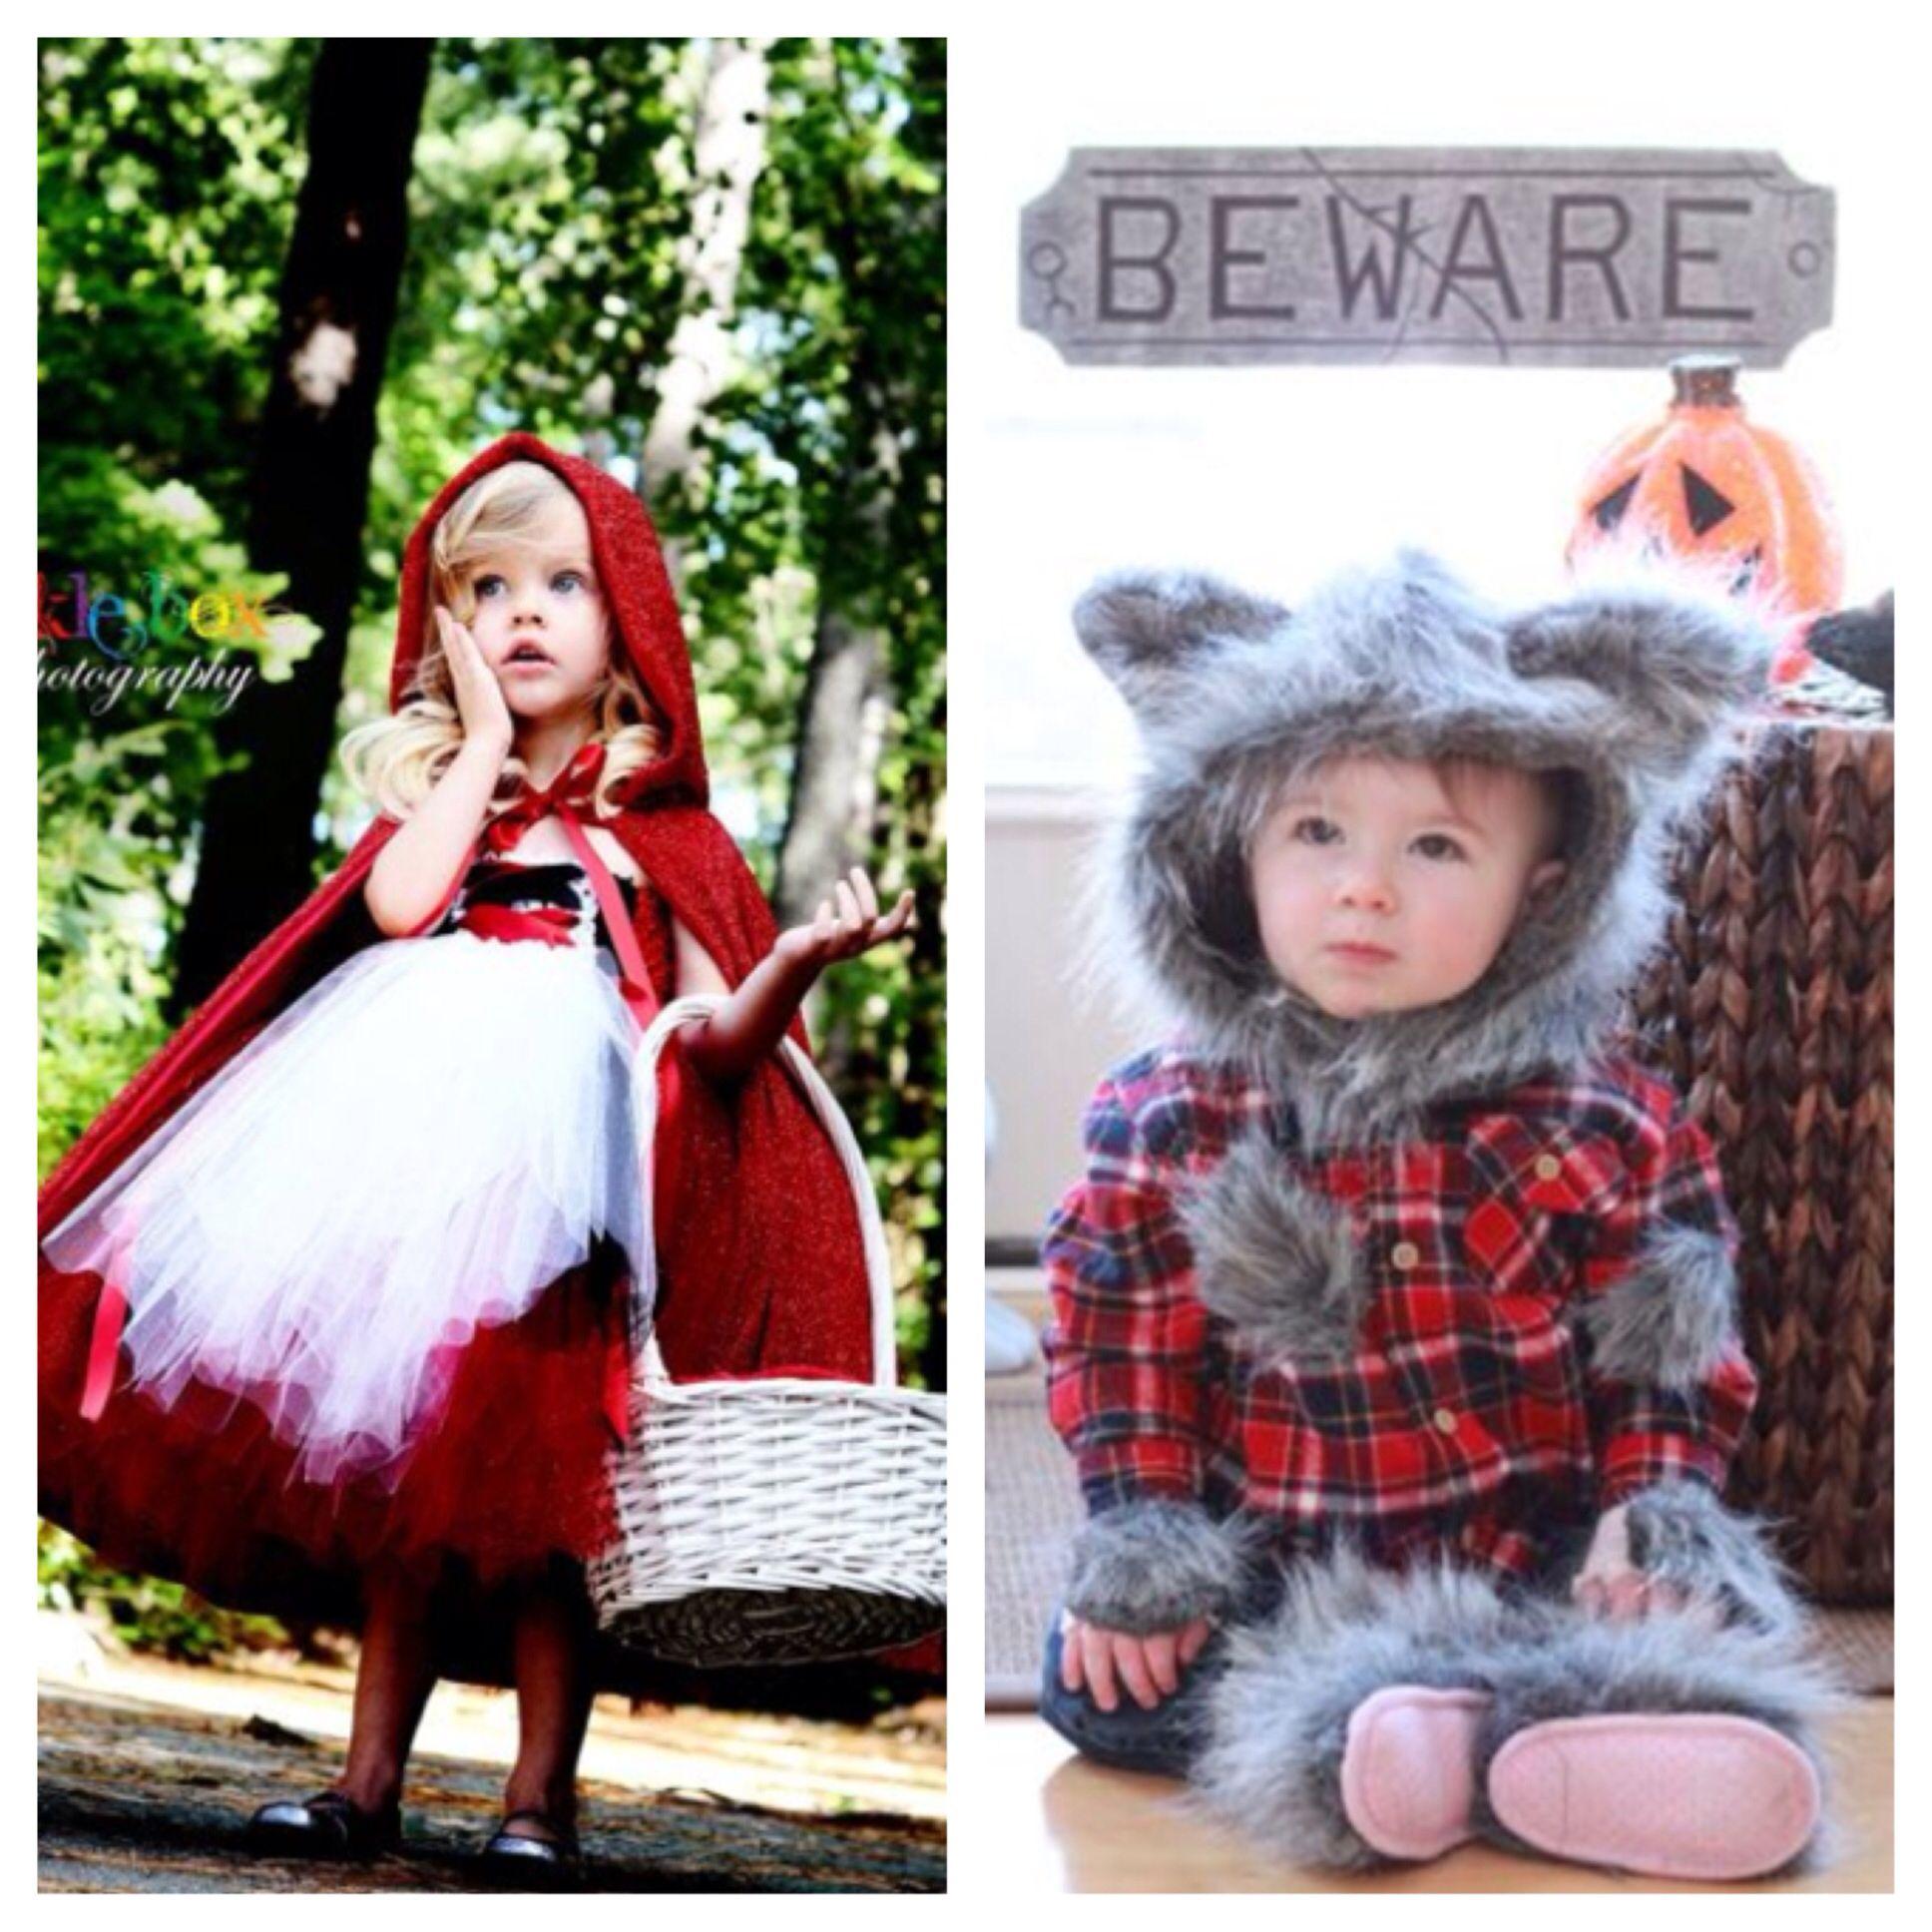 Halloween costume ideas sibling fun pinterest for Cute boy girl halloween costume ideas